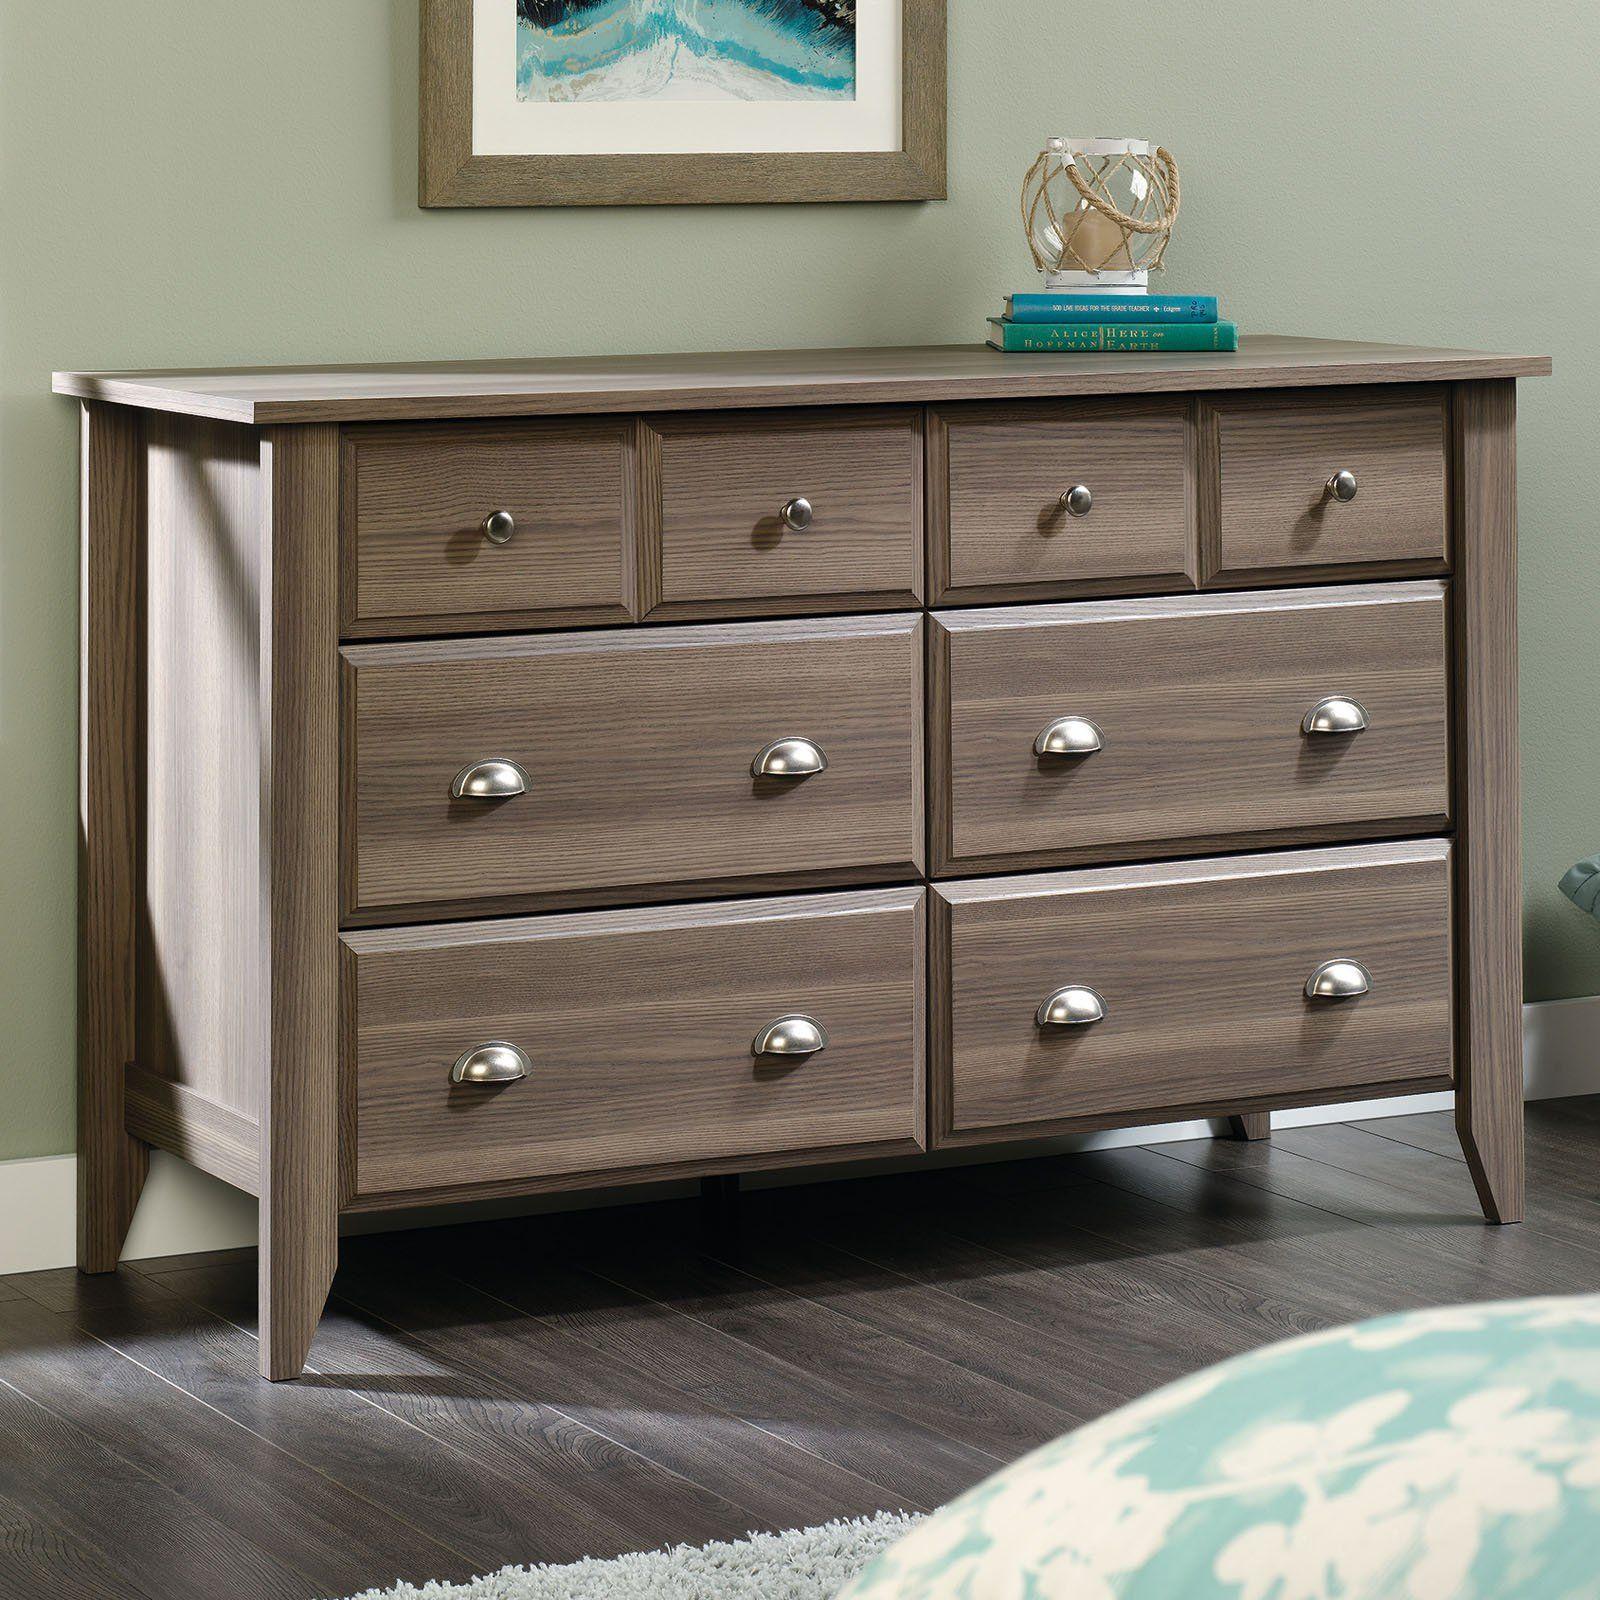 Best Sauder Shoal Creek 6 Drawer Dresser With Images 400 x 300